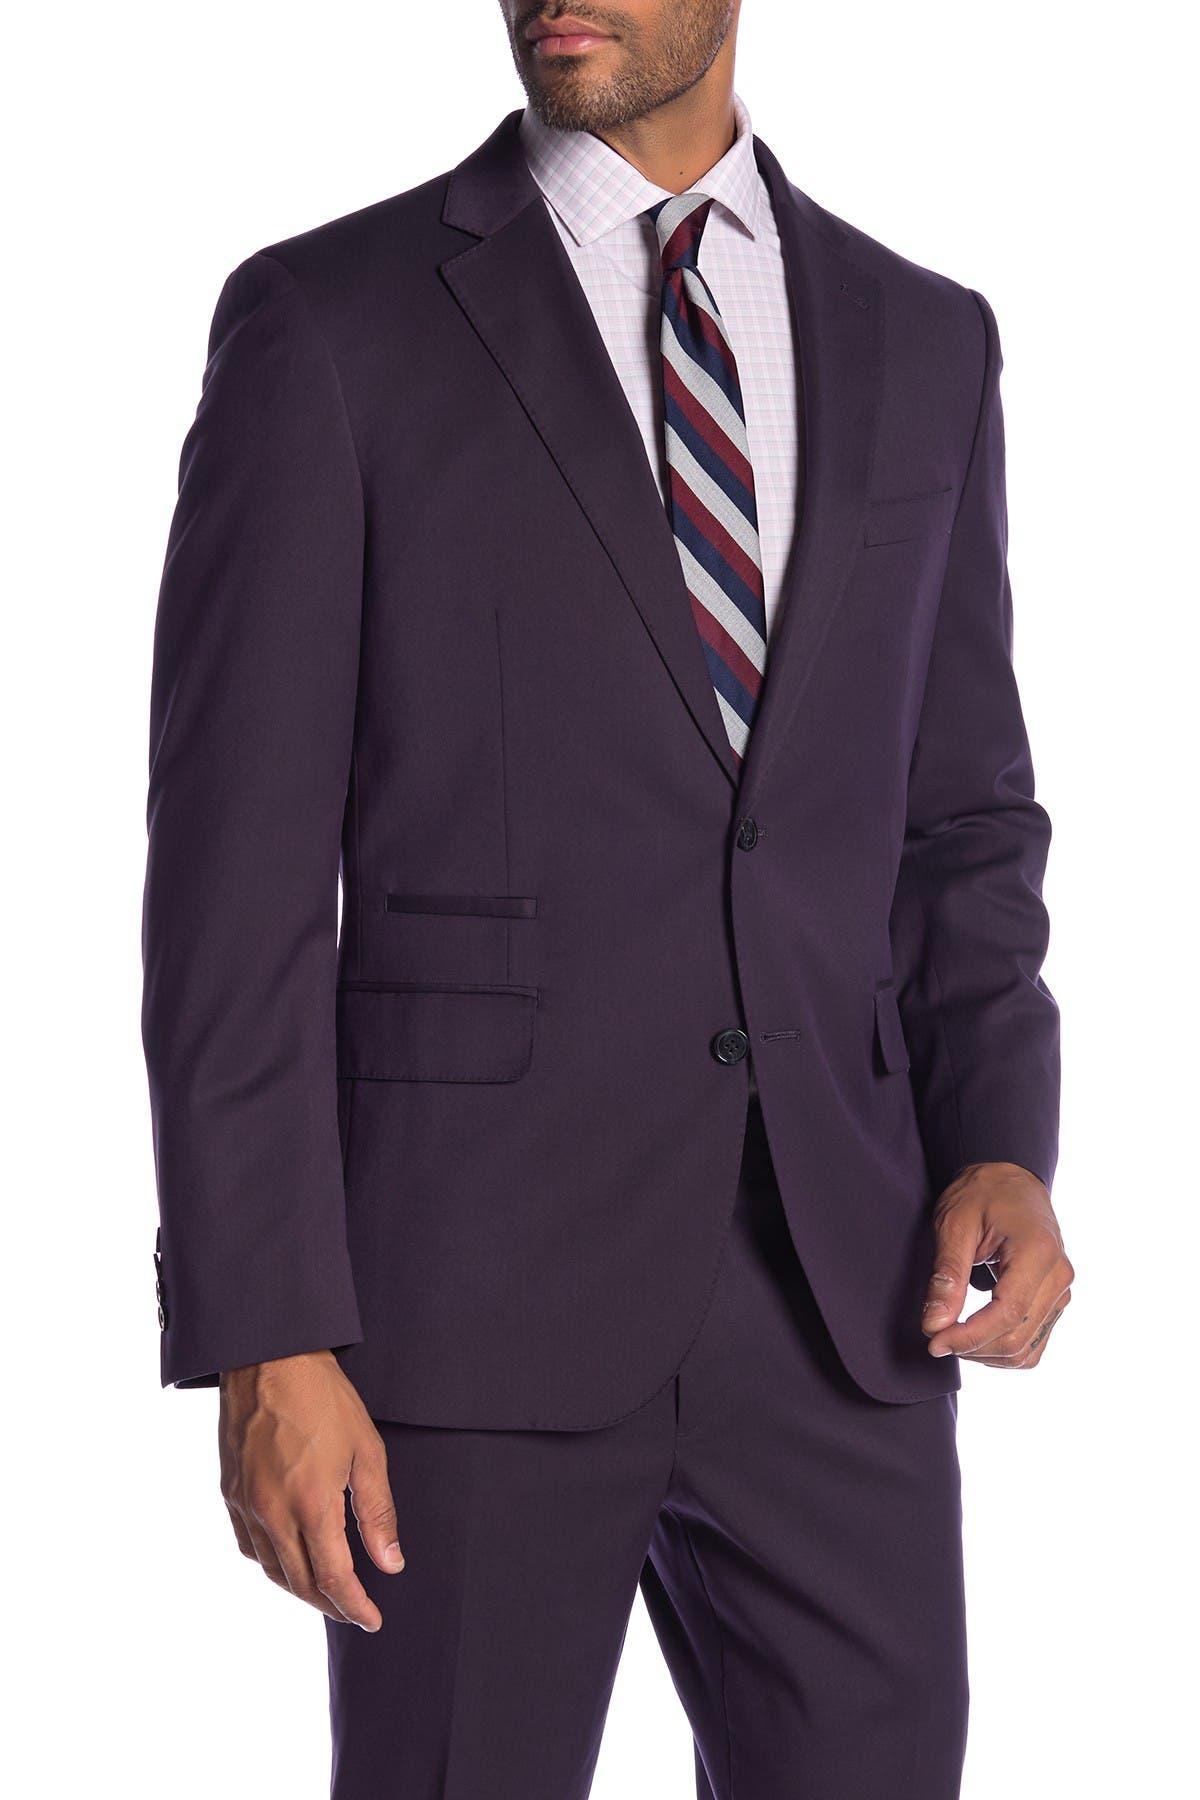 Image of SAVILE ROW CO Rivington Purple Two Button Notch Lapel Modern Fit Gab Suit Separate Jacket